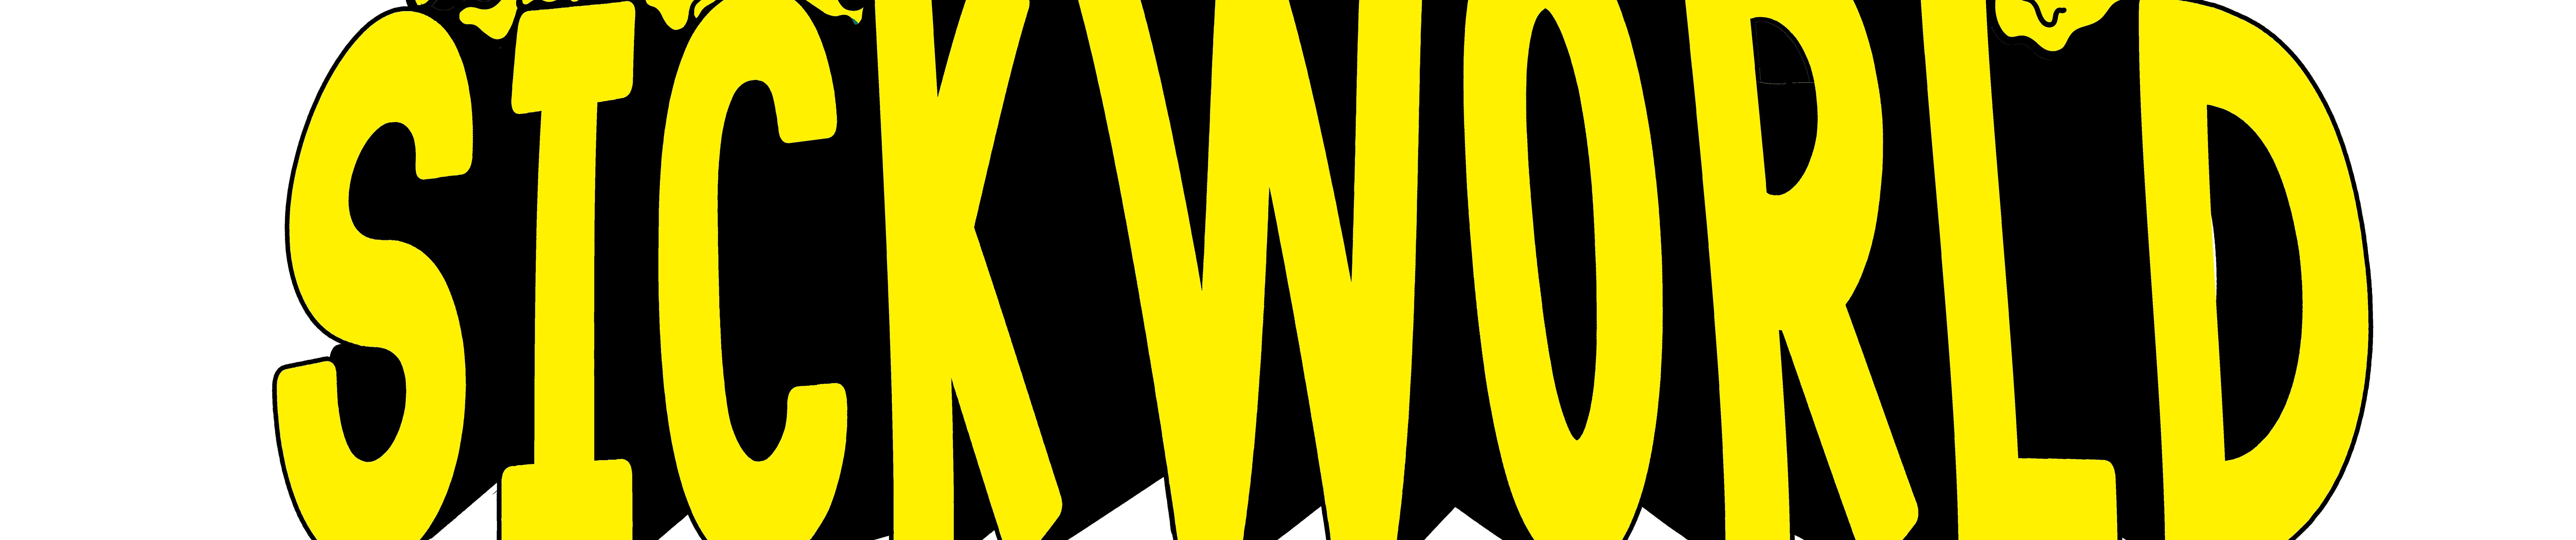 mcashhole - WHO IT IS 2 (ft  6IX9INE, XXXTENTACION, MIGOS, LIL PUMP